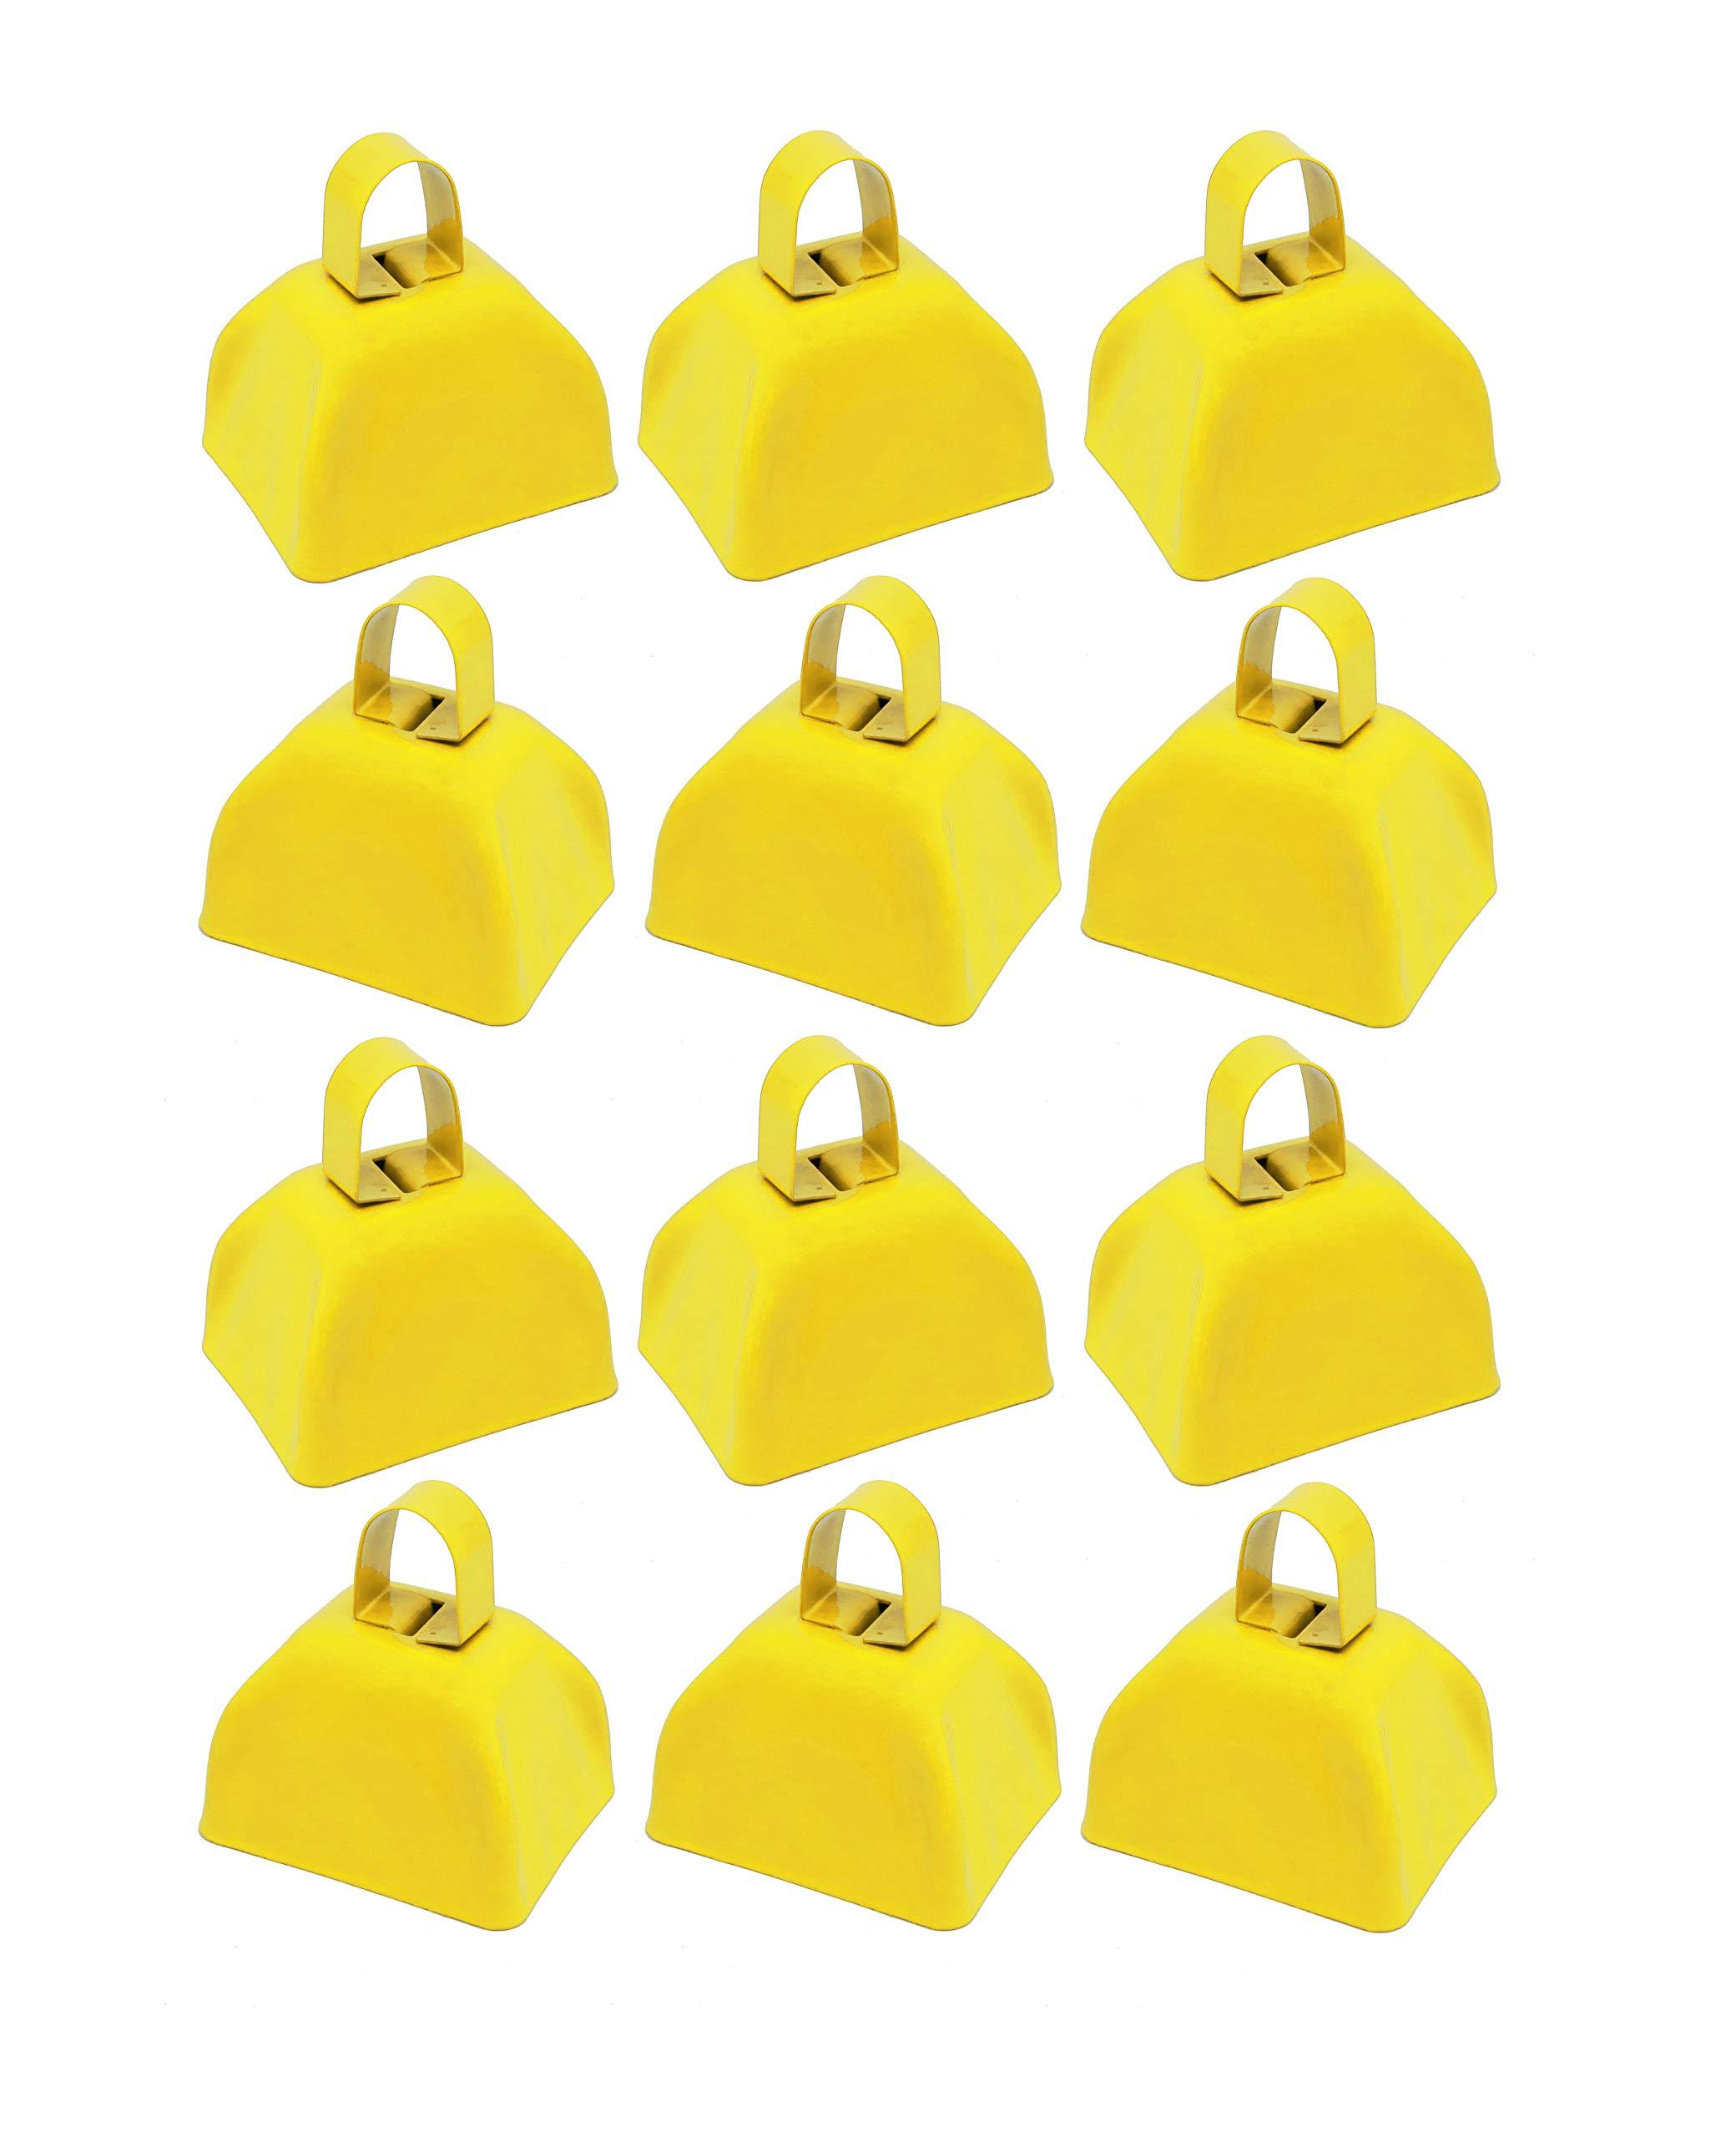 Metal School Cowbells - Set of 12 Yellow Metal Cowbell Noisemakers (Yellow Cowbells) by SNInc.